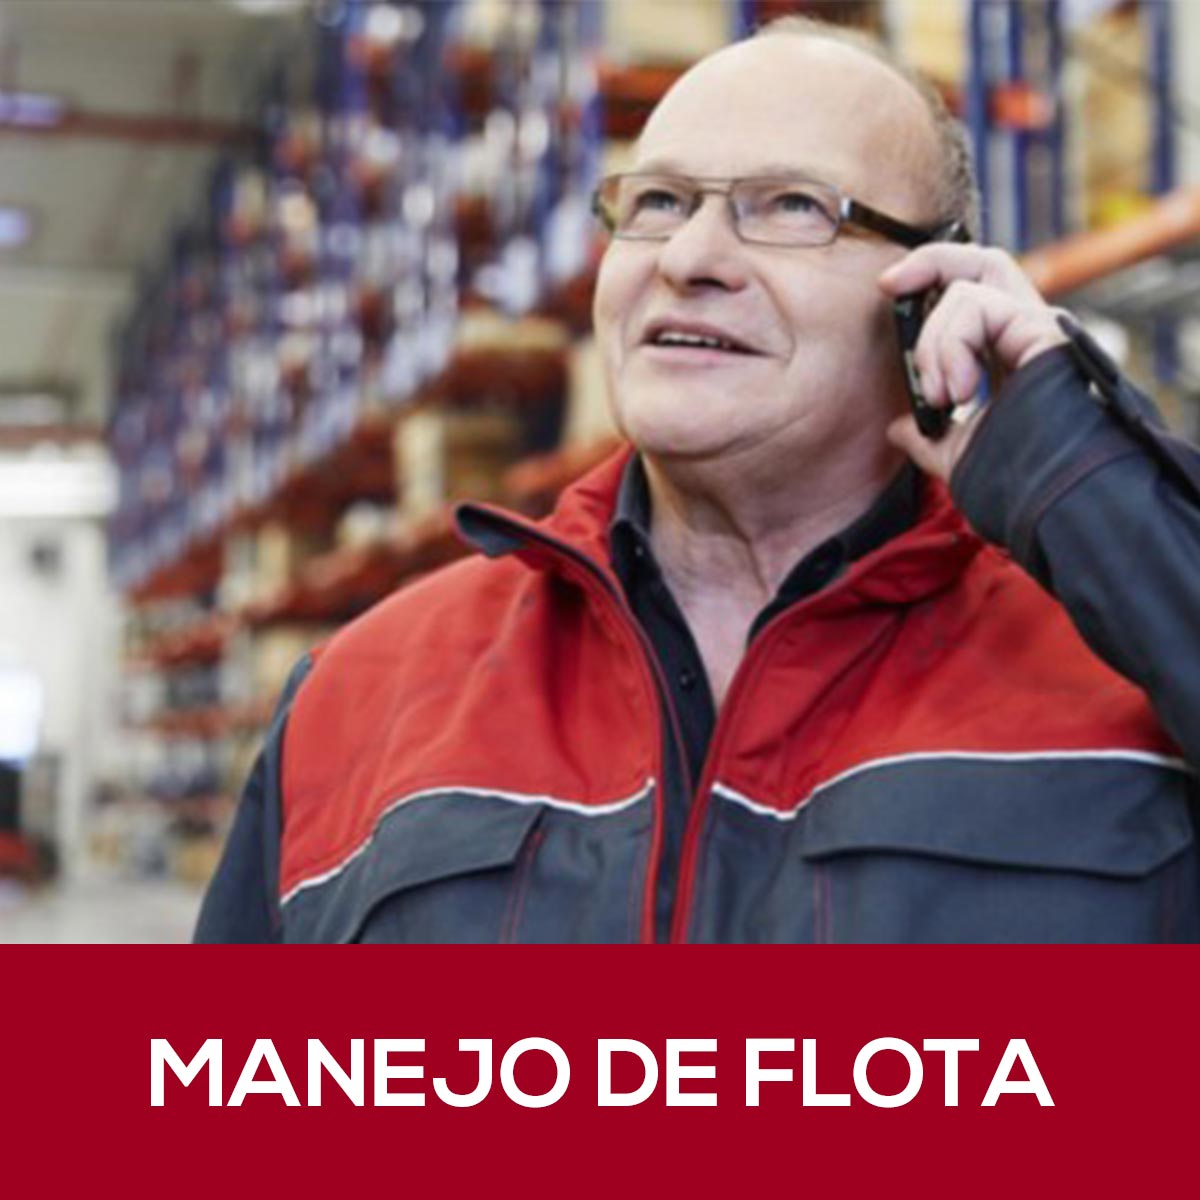 MANEJO DE FLOTA